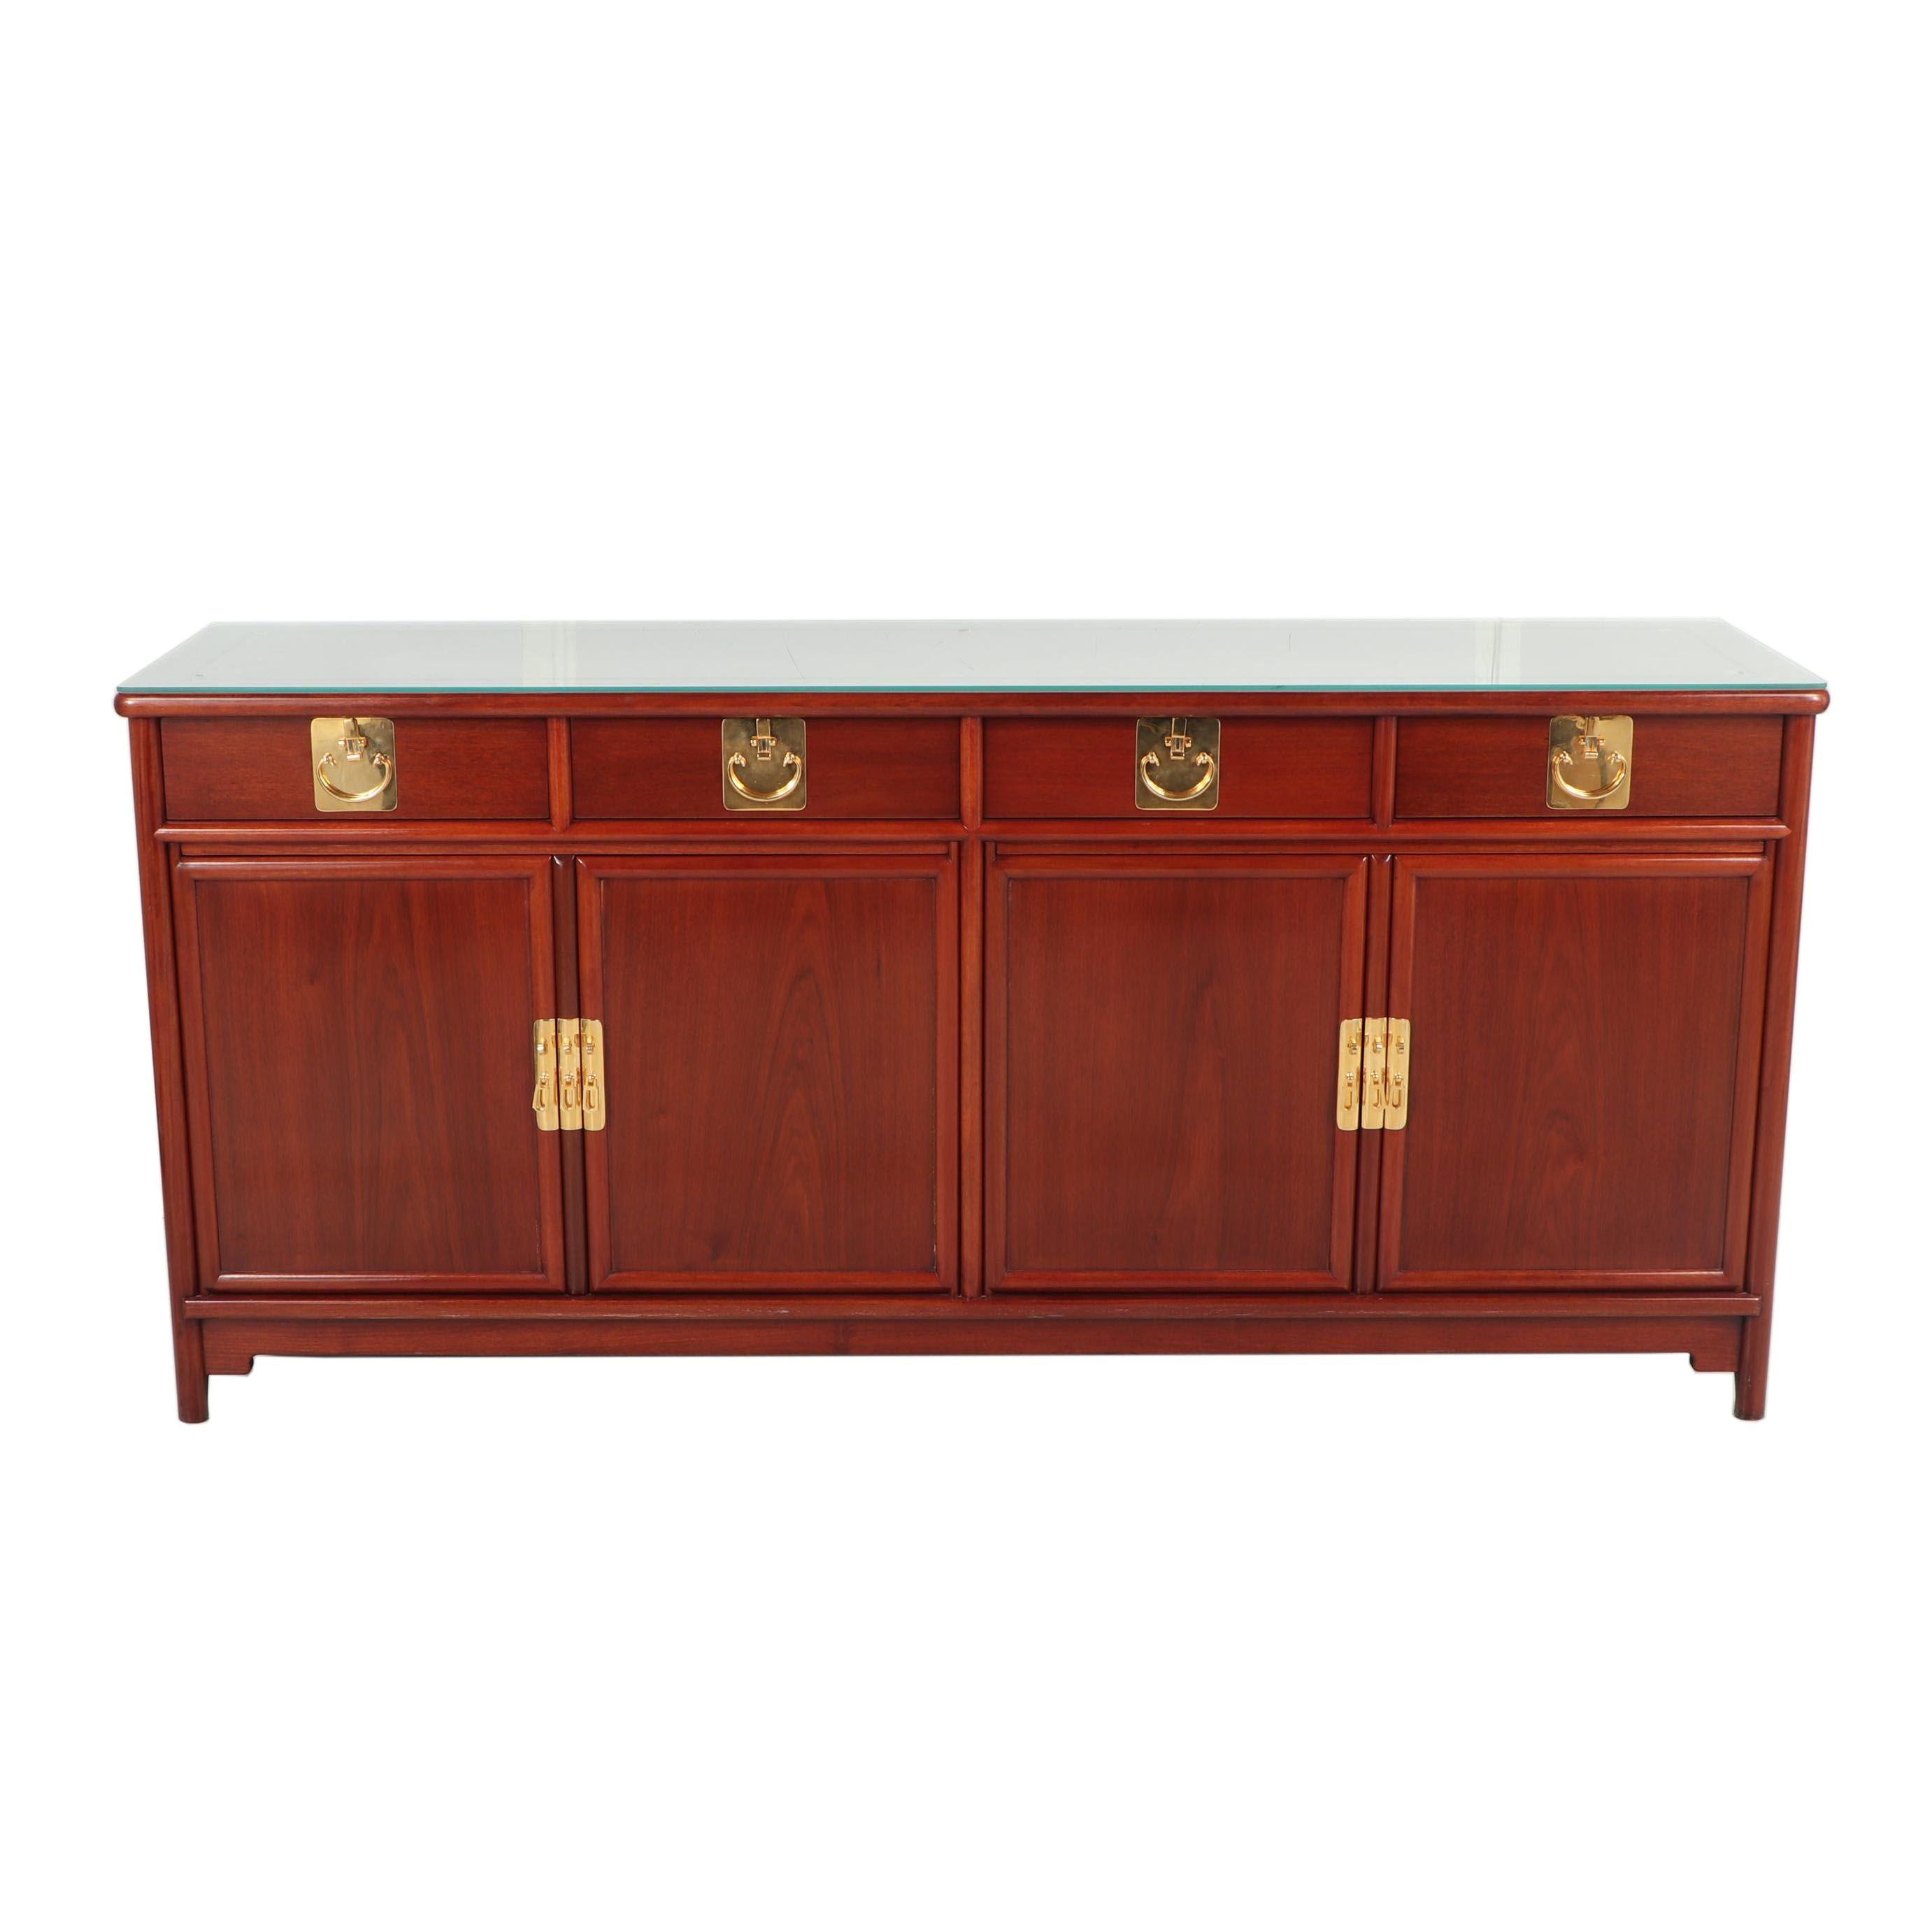 Chinese Style Mahogany Veneer Sideboard, Late 20th Century